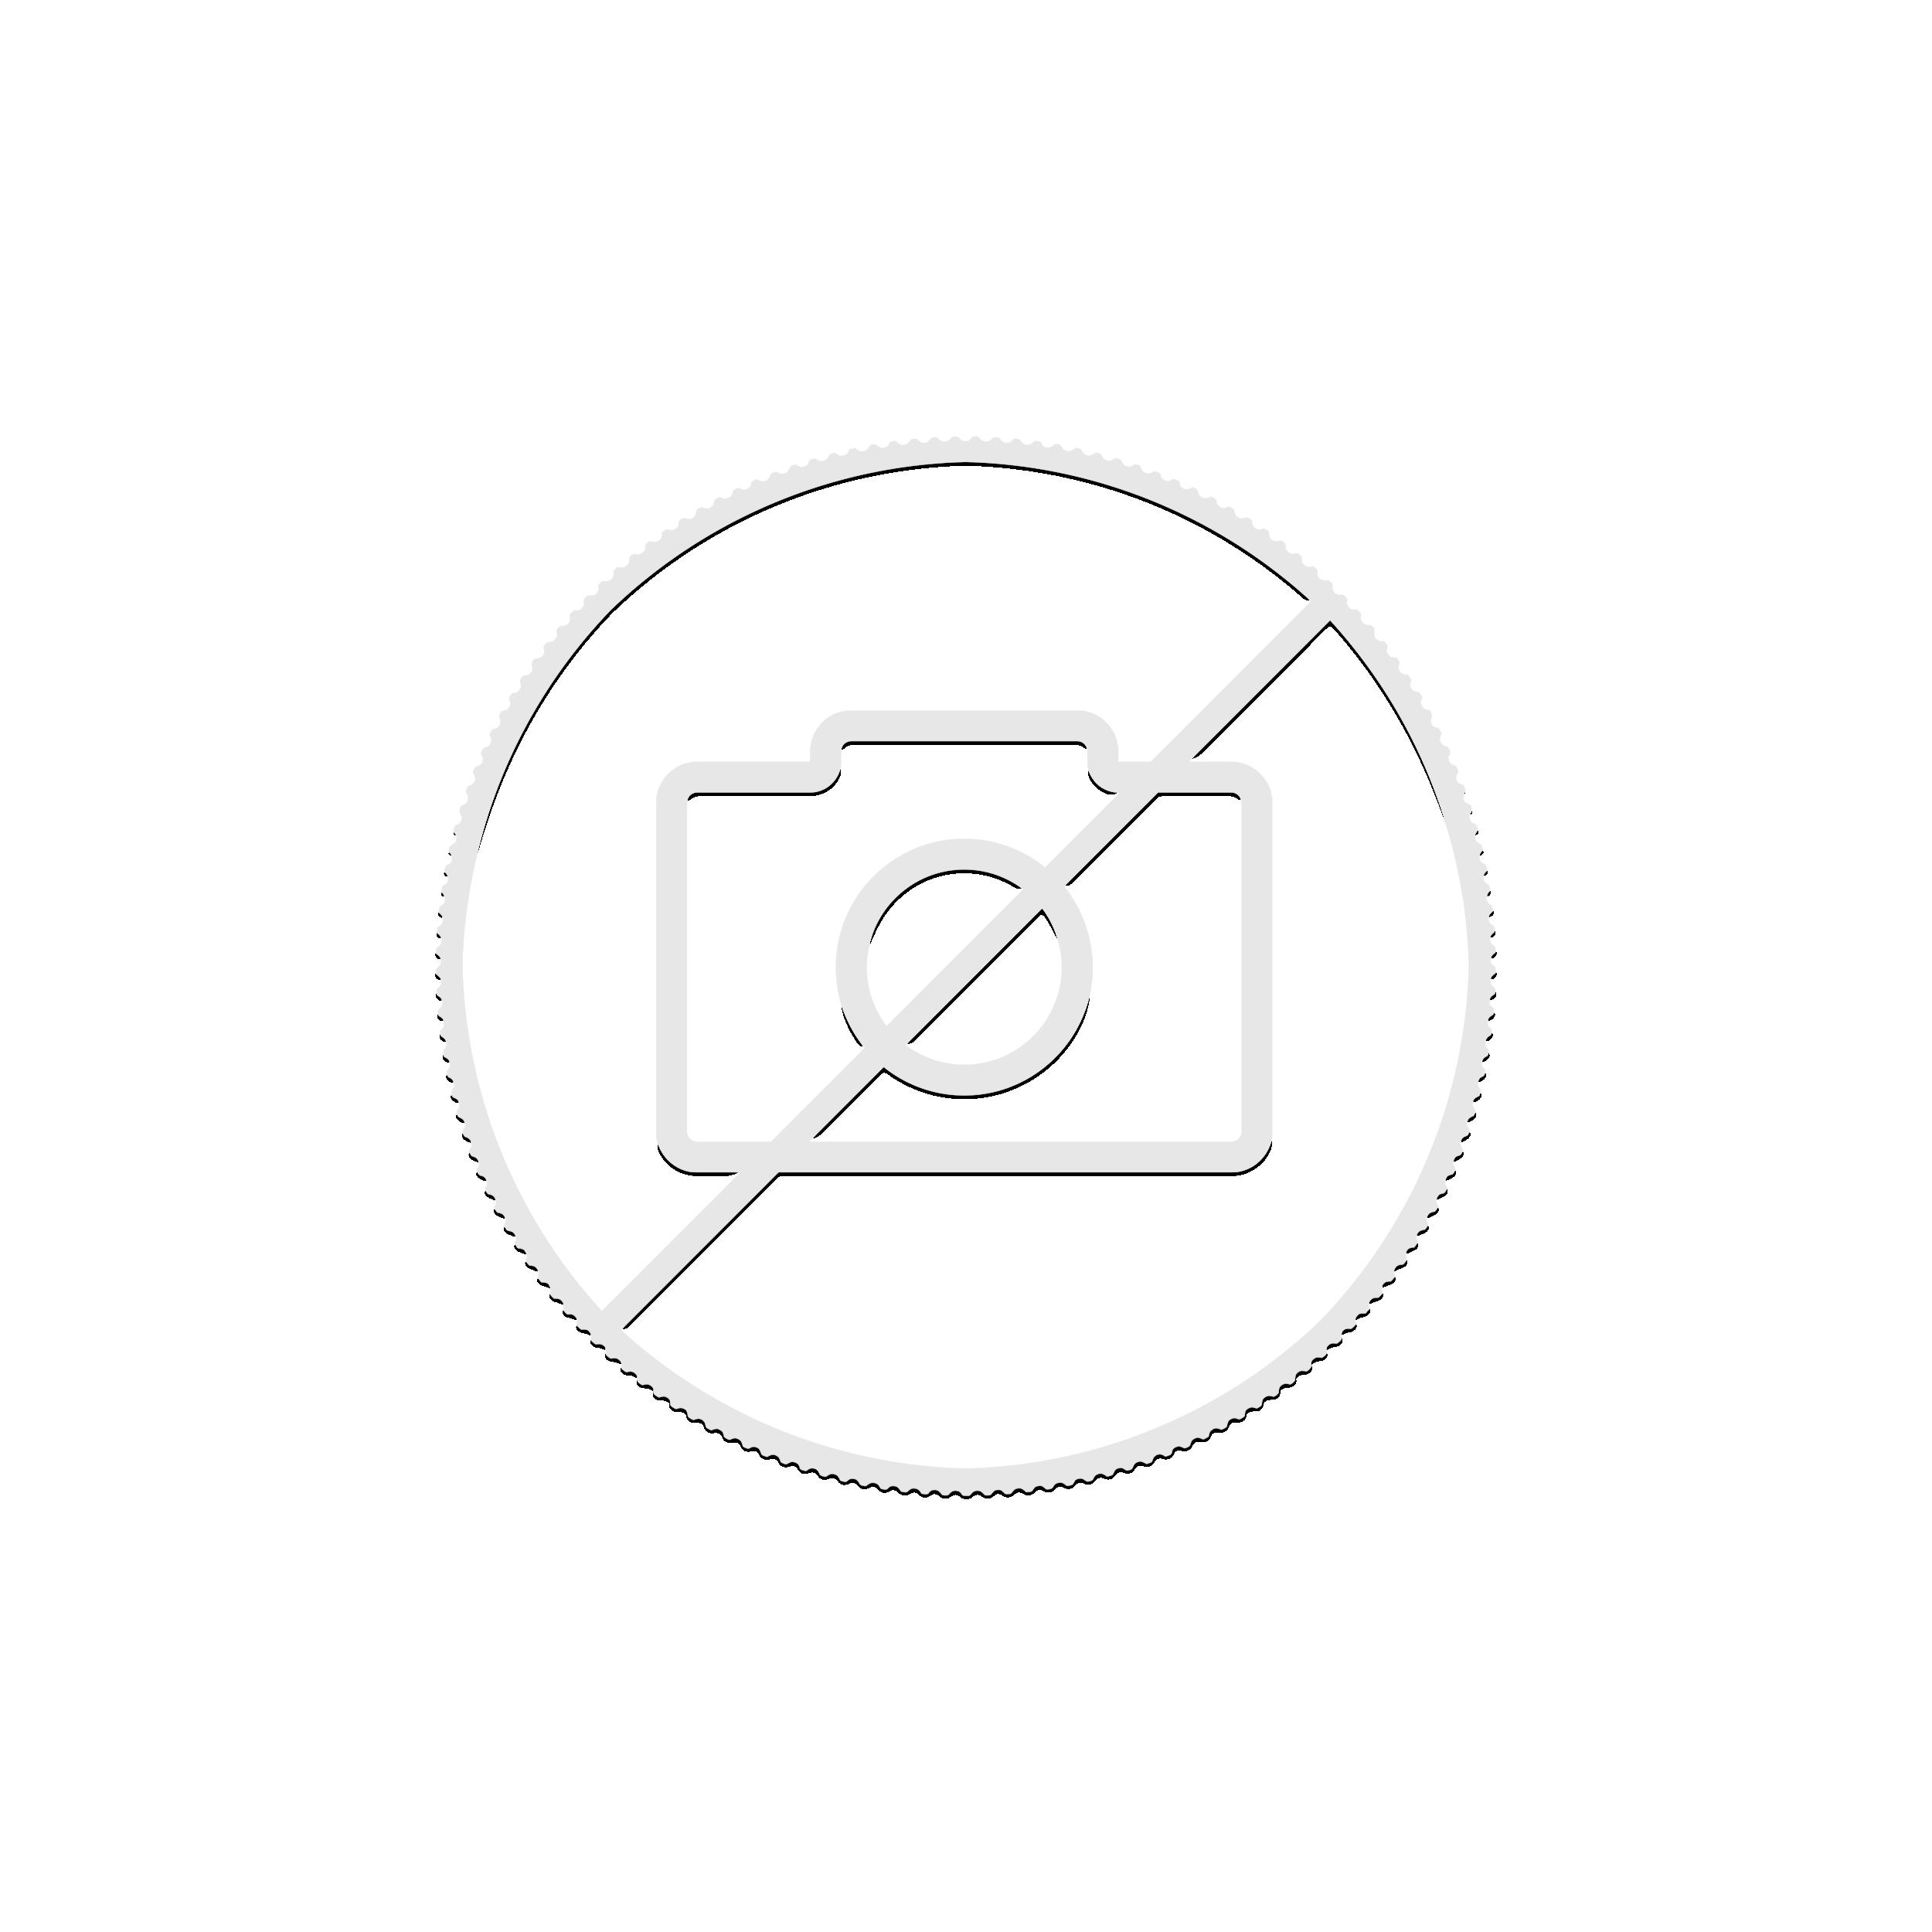 2 troy ounce zilveren munt Phoenix 2018